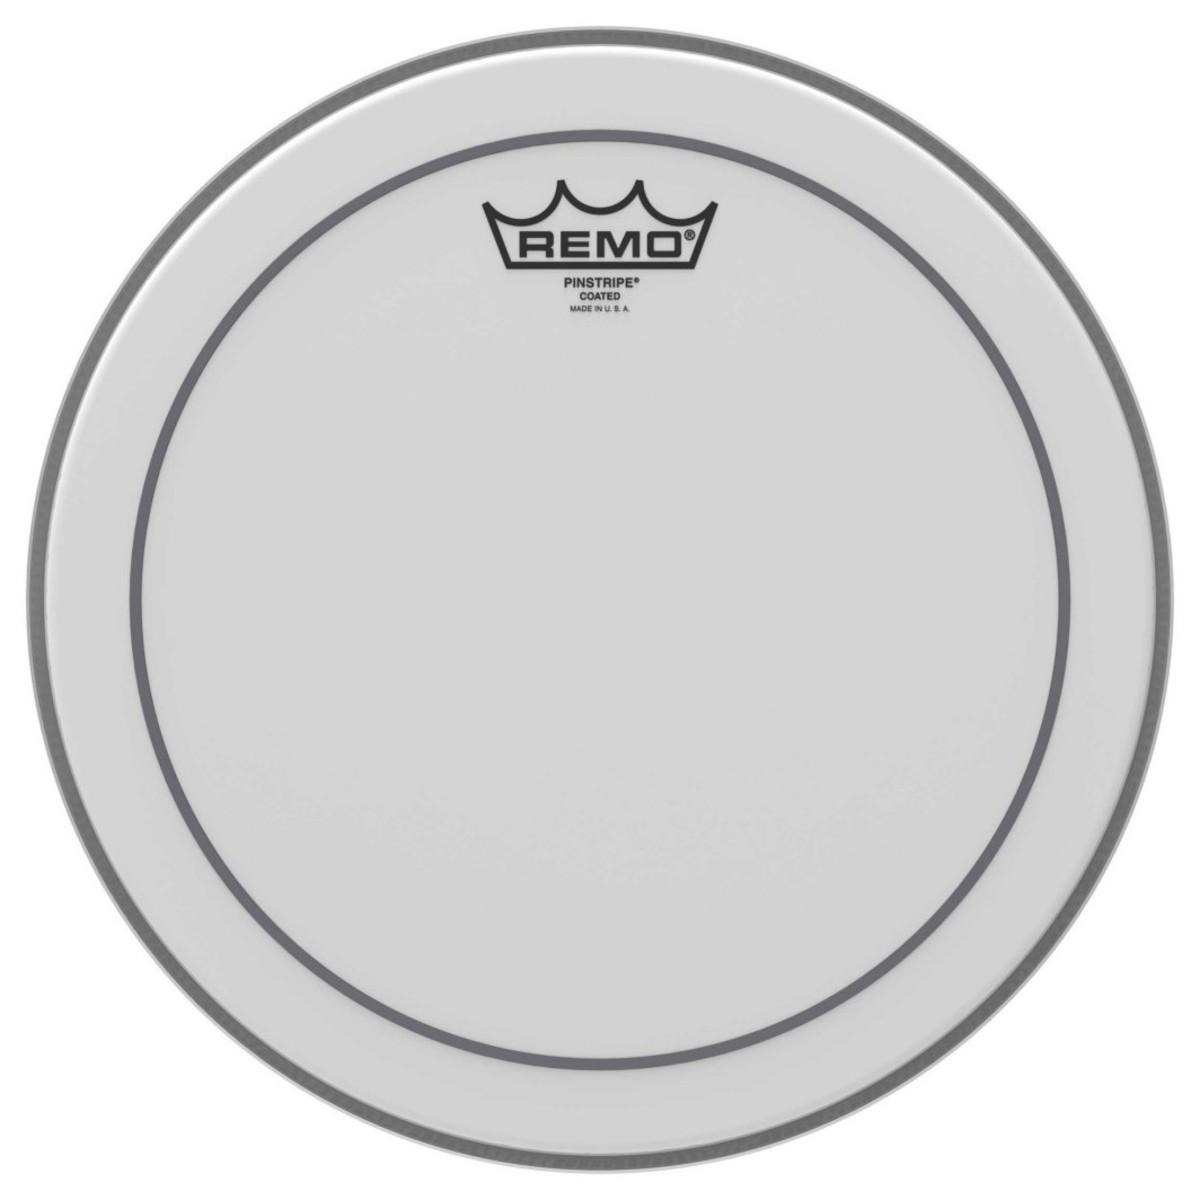 Remo Pinstripe Coated 16 Drum Head